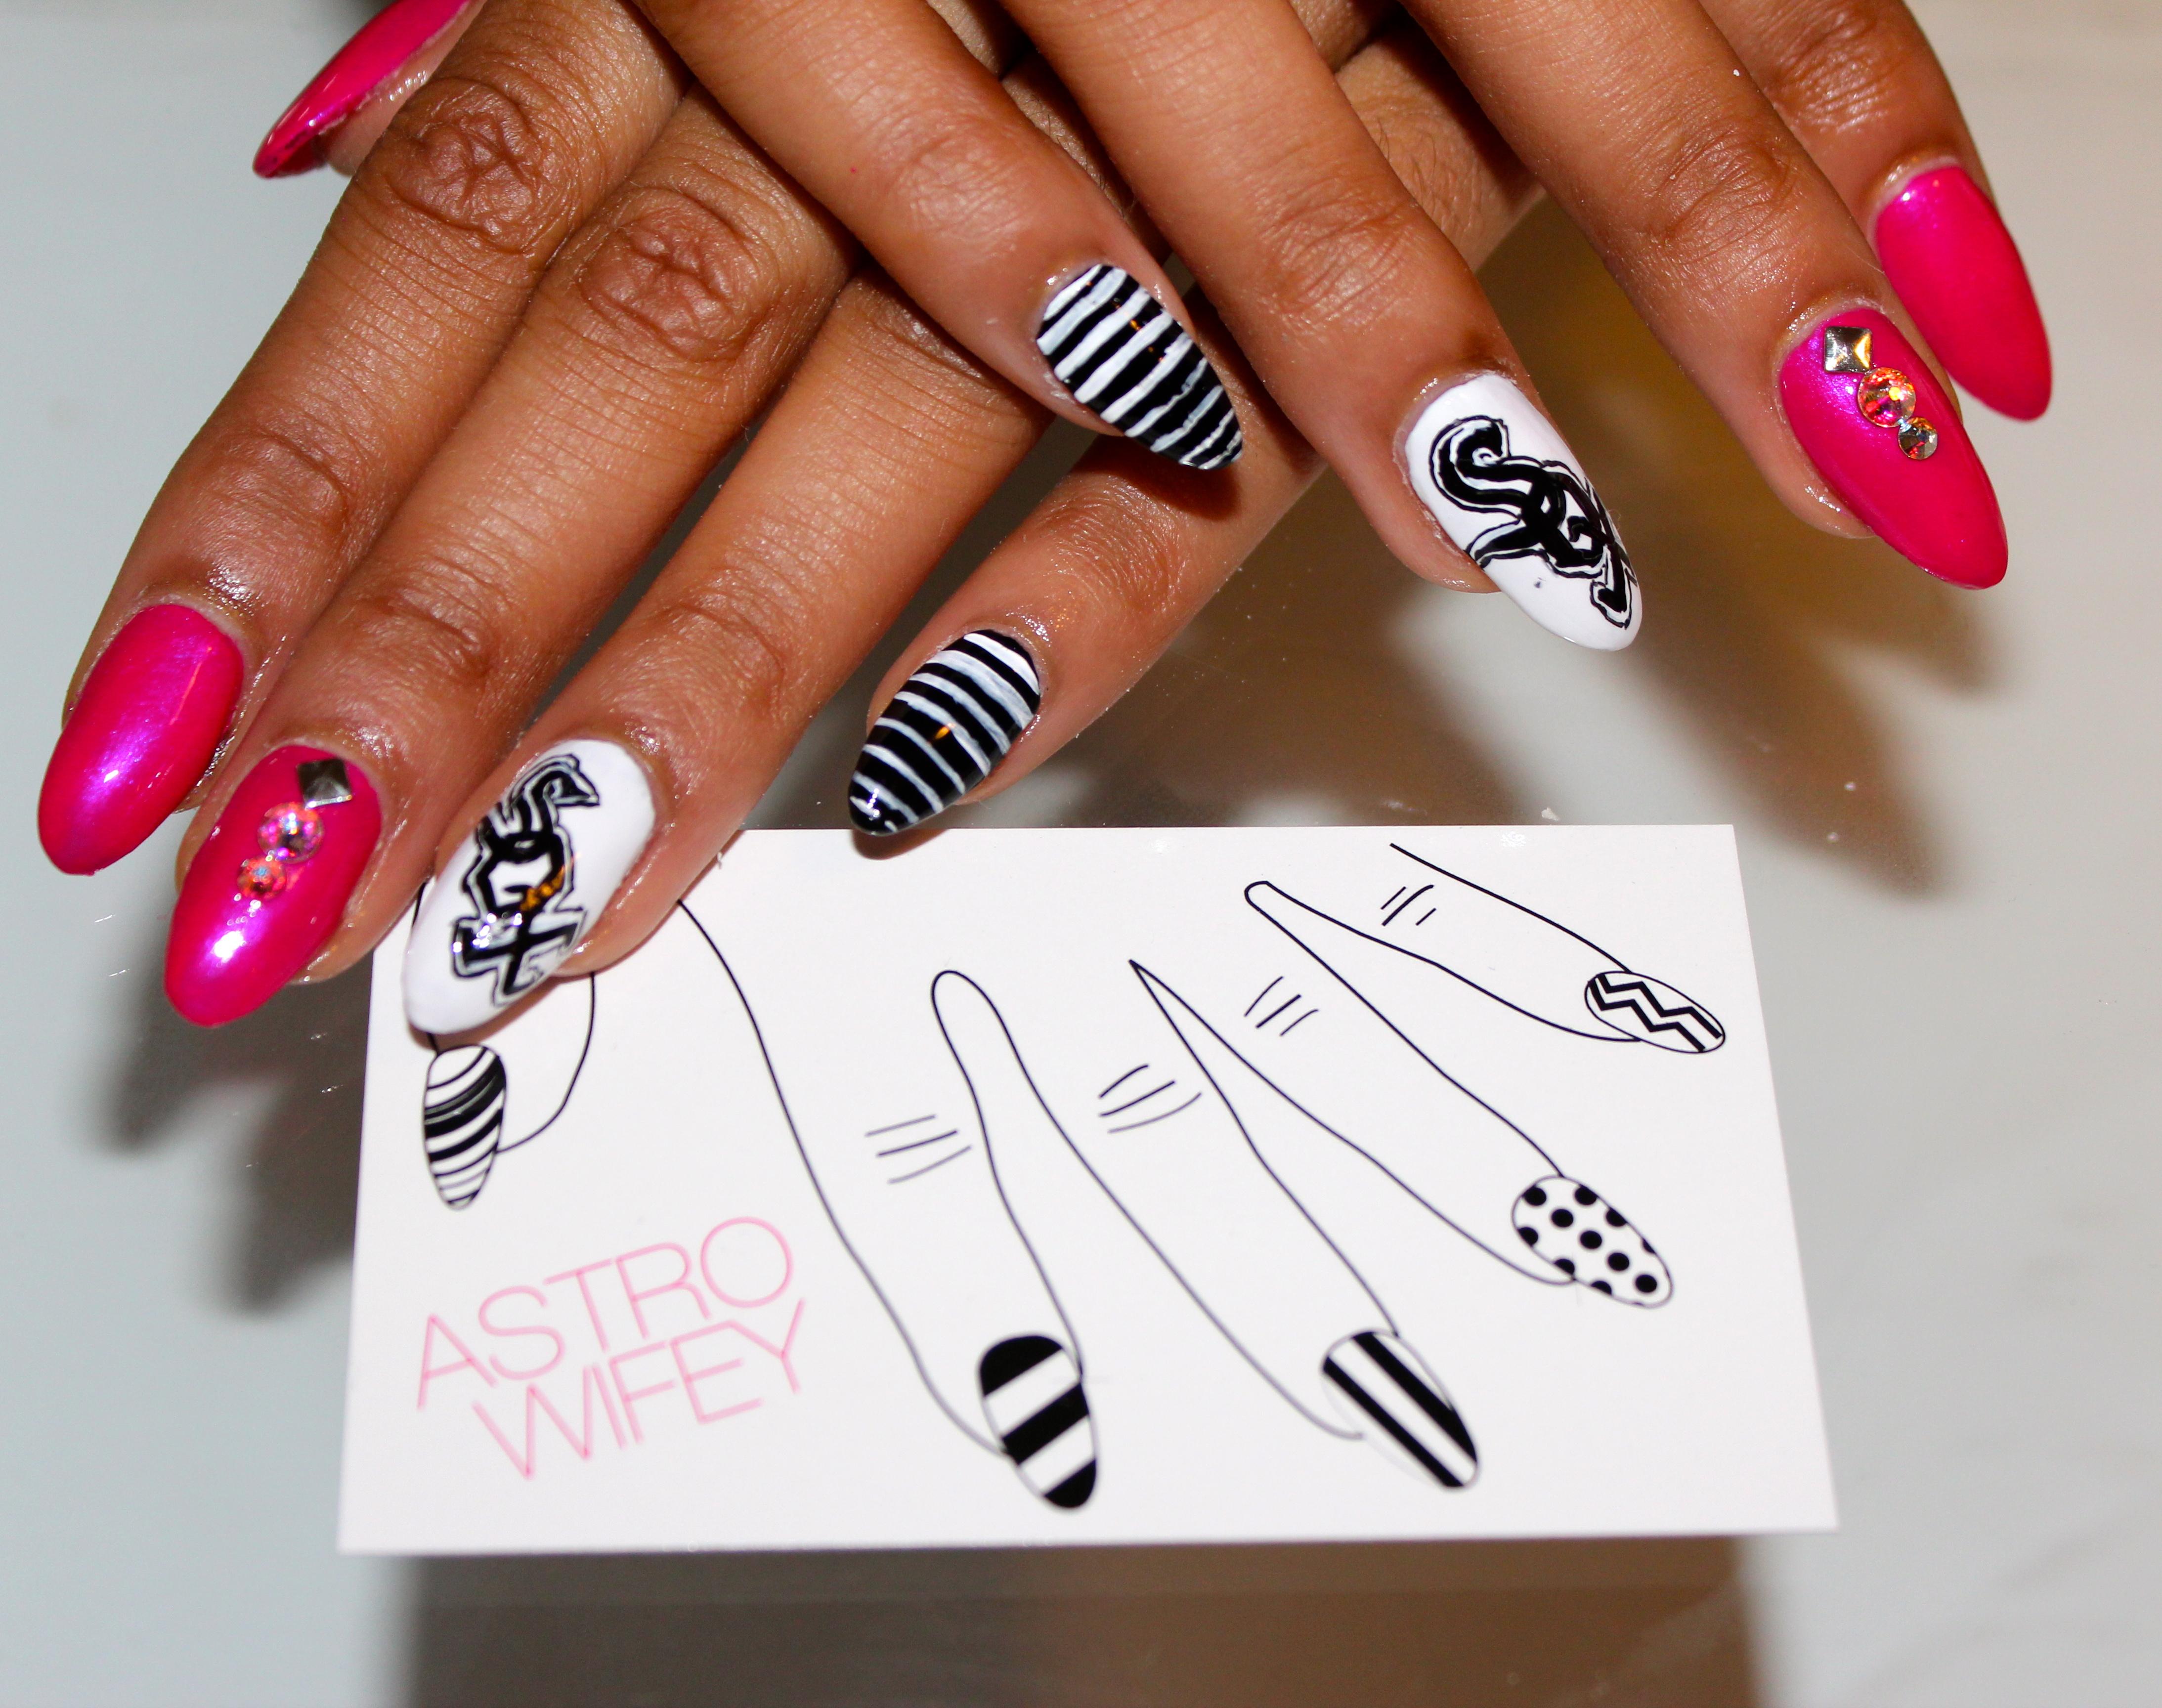 astrowifey | Designer Manicurist | Nail Blogger | Page 35